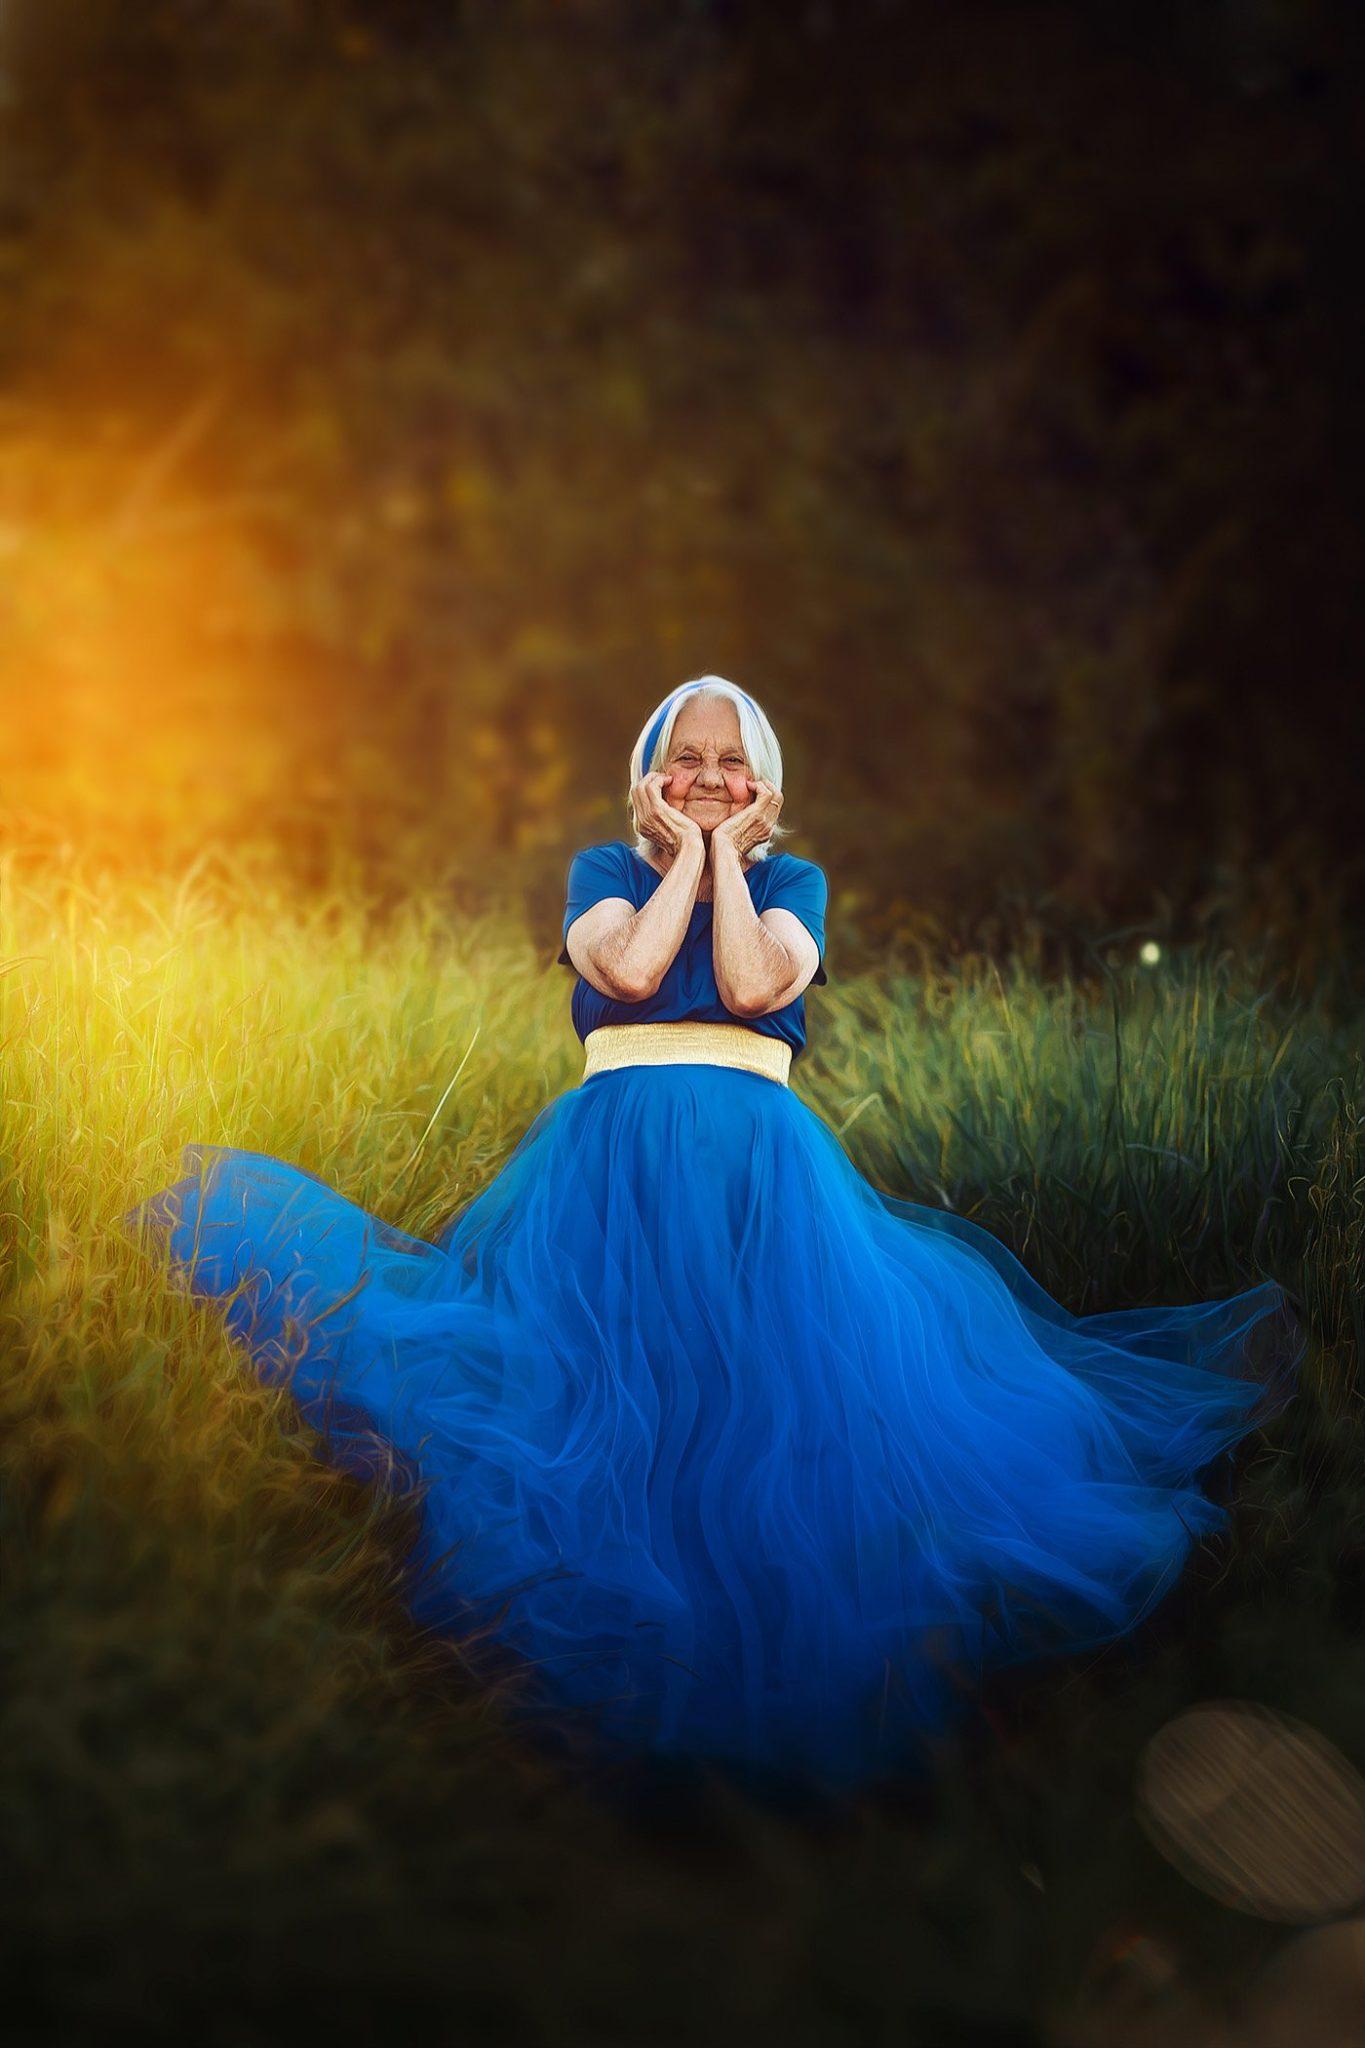 neto ensaio fotográfico avó princesas da disney